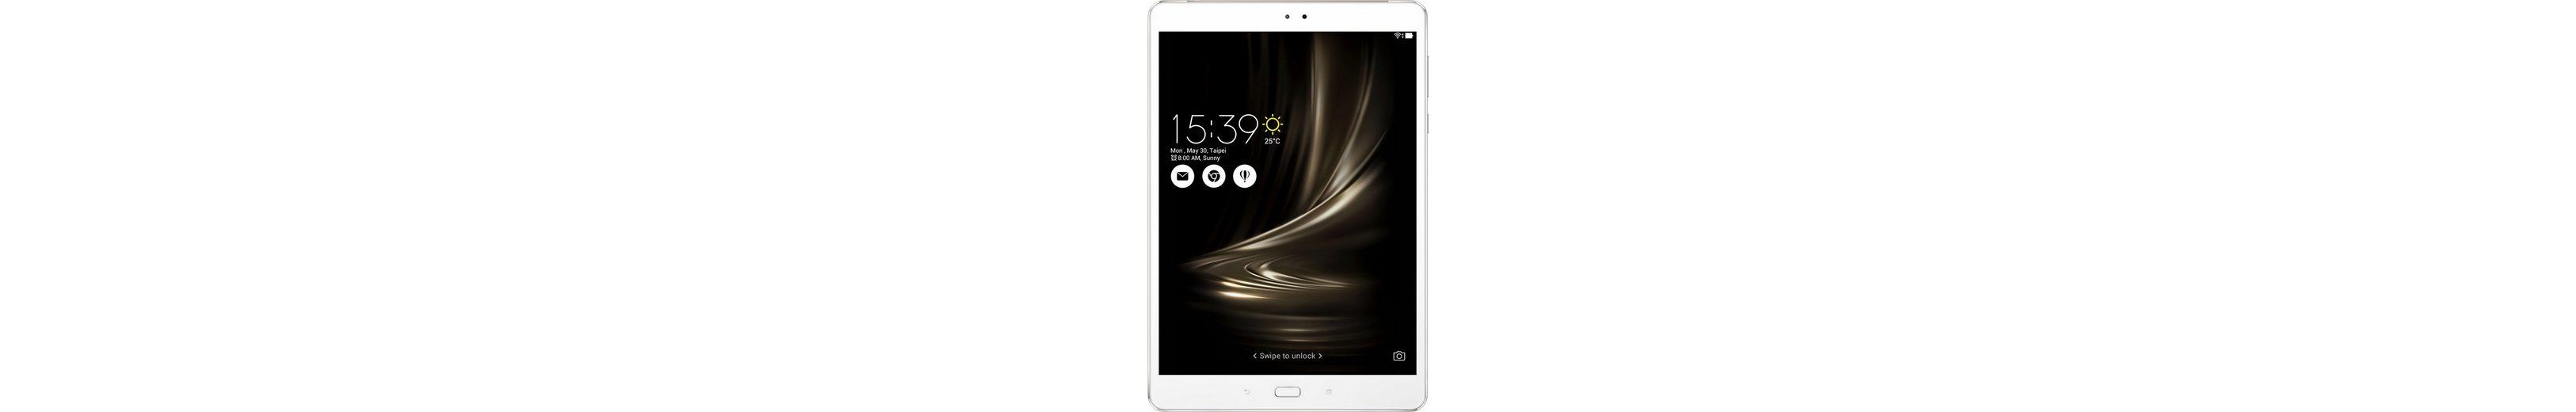 Asus Zenpad Z500M-1J006A Tablet-PC, Android 6.0, 24,6 cm (9,7 Zoll), 4096 MBLPDDR3